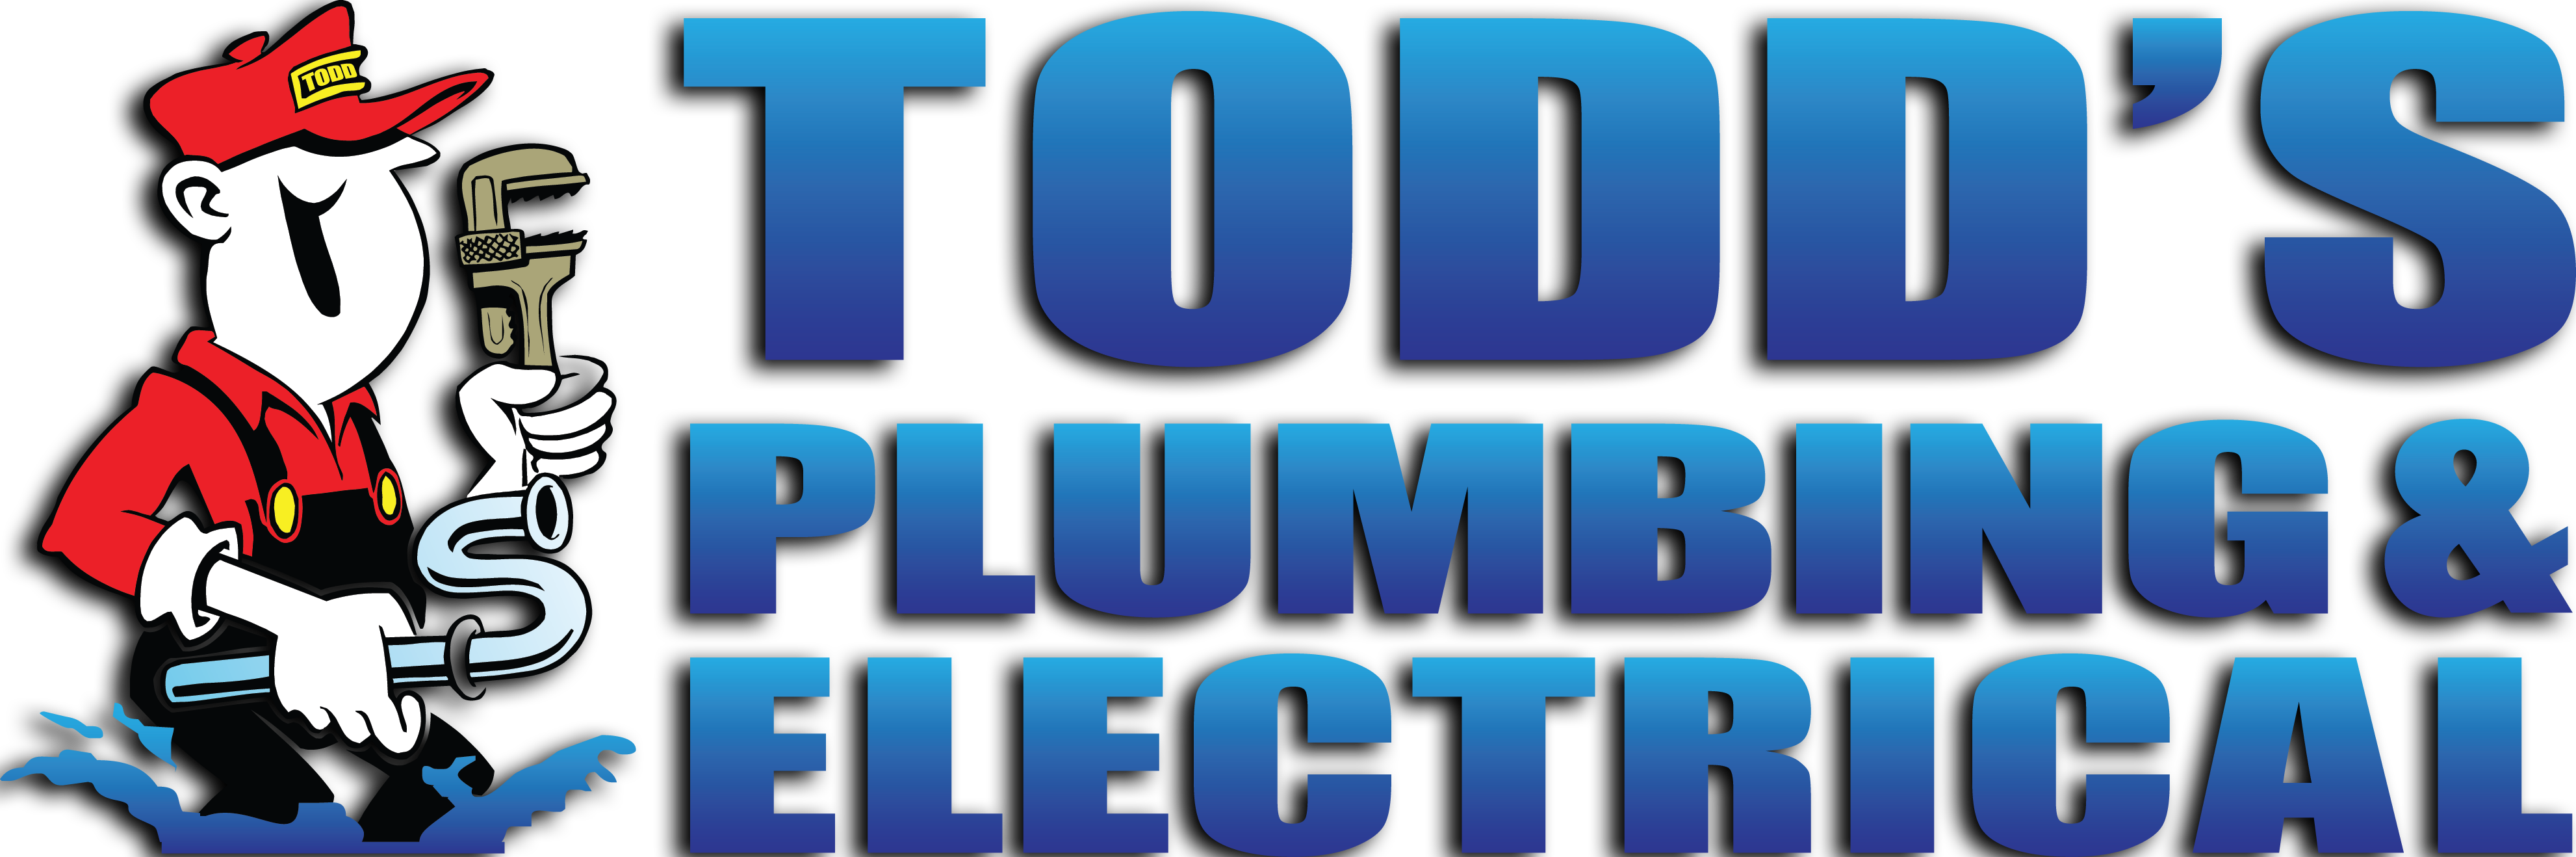 Todd'd Plumbing & Electrical